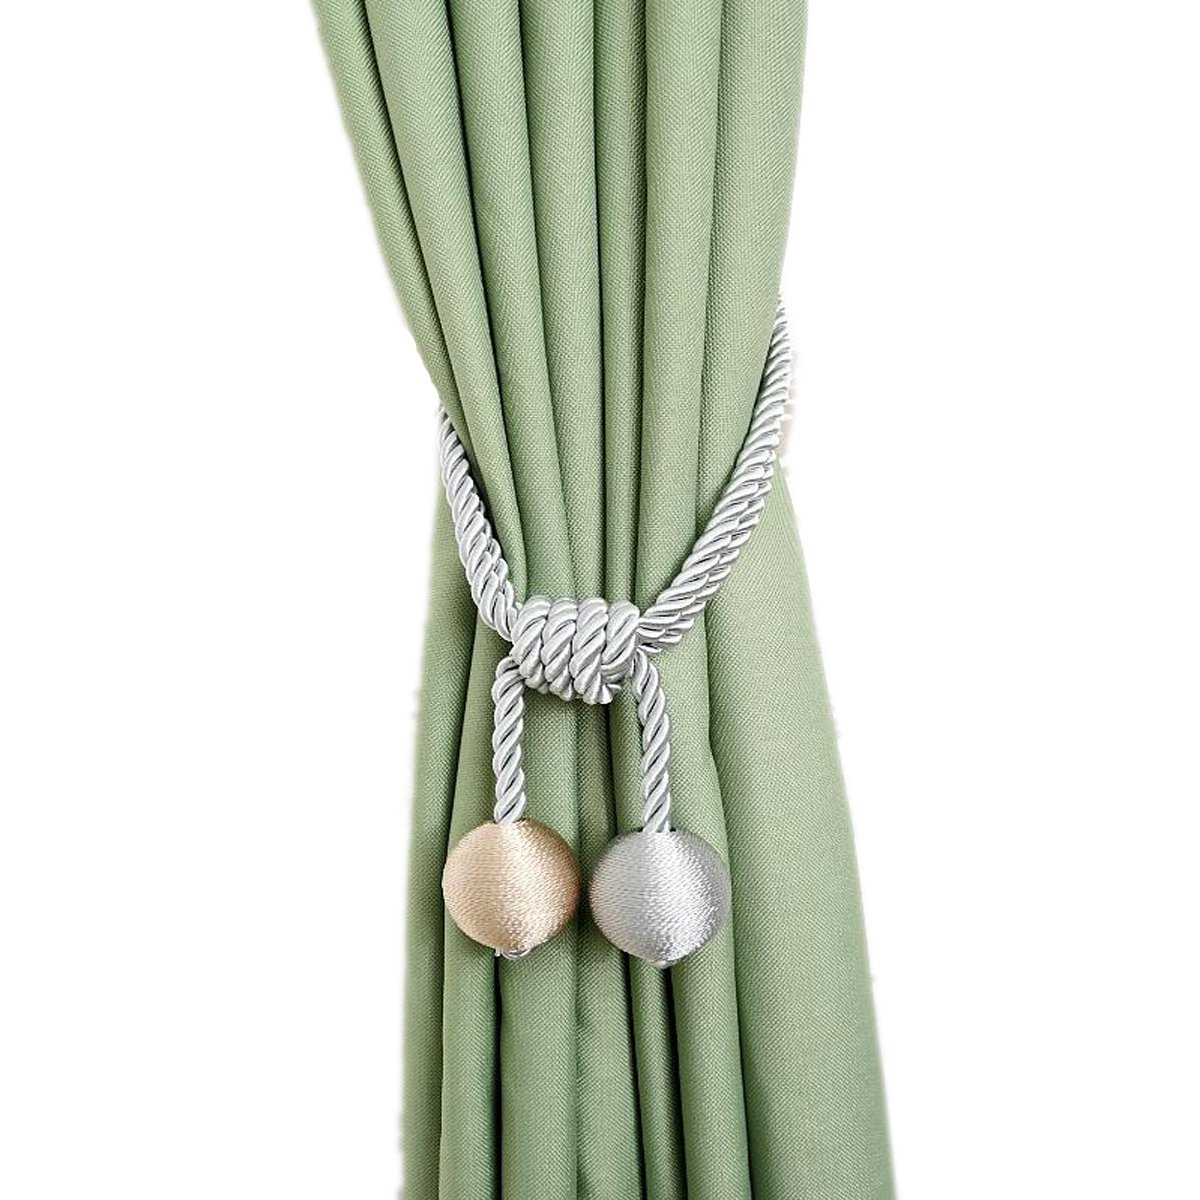 Fongbay a pair of 2 New style hanging rope curtain adornment hang ball Pack Window Rope Holdbacks and curtain tassel tiebacks(grayish)